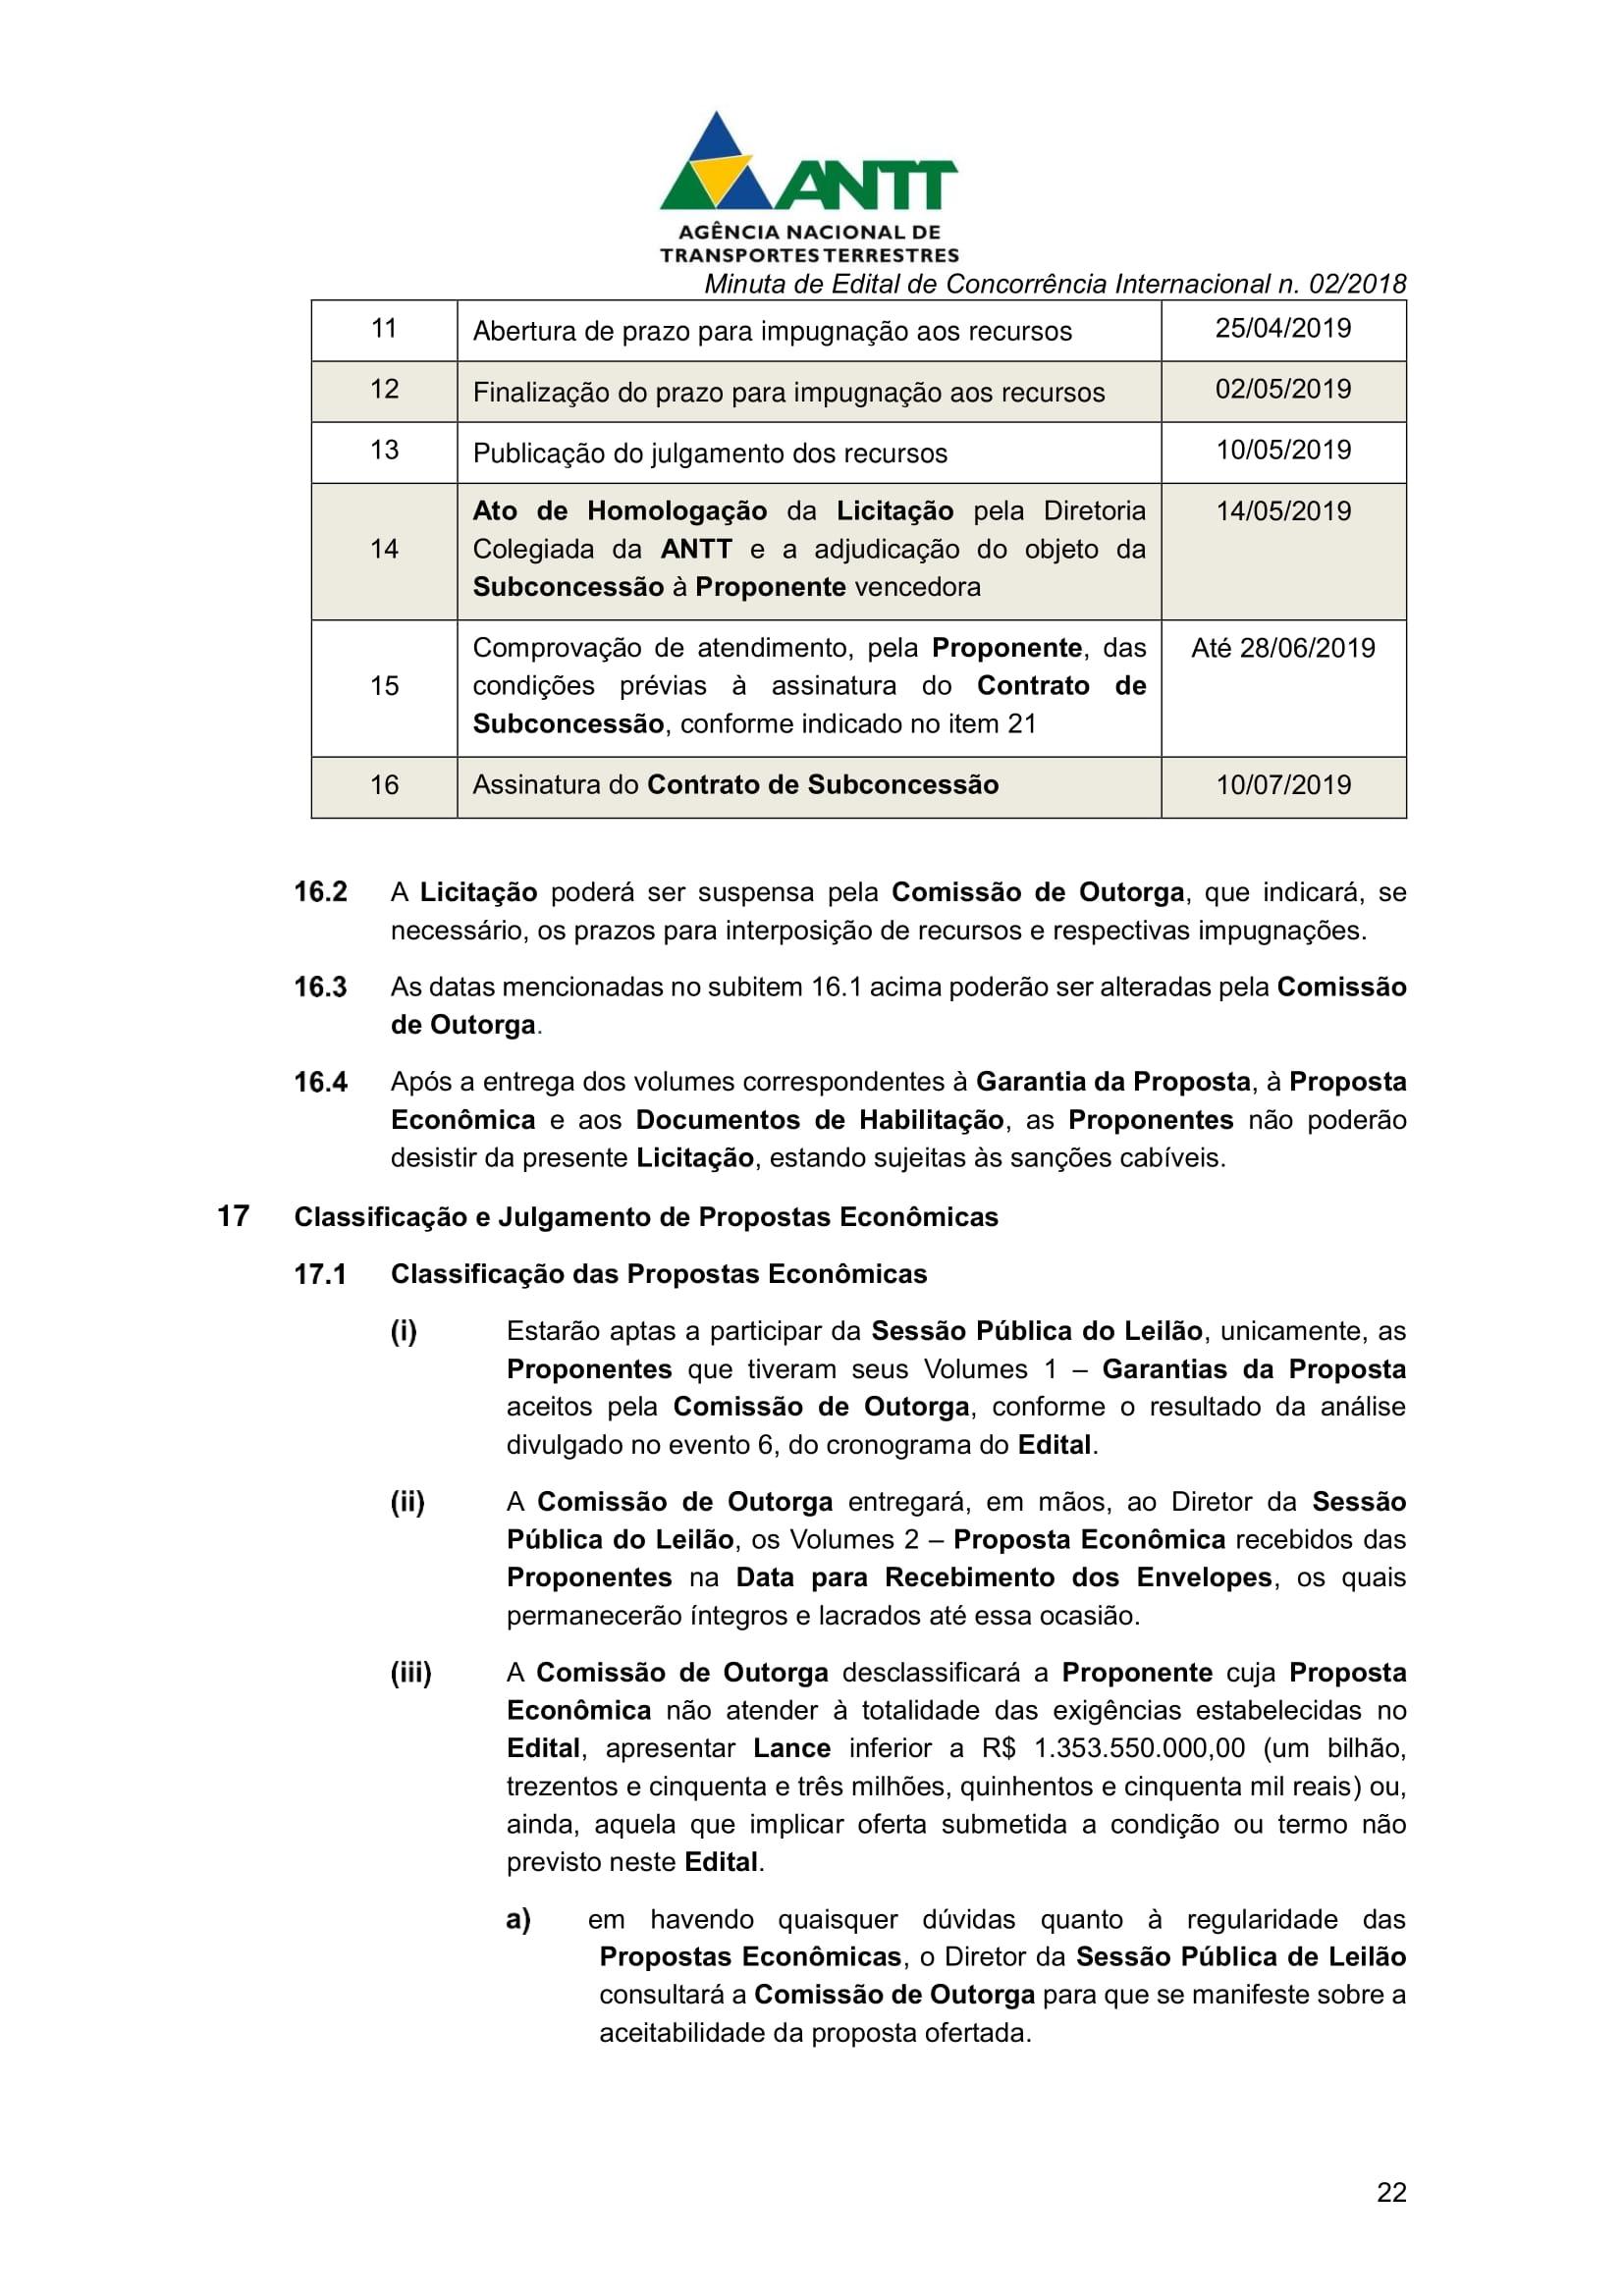 minuta_de_edital_-_porto_nacional-estrela_doeste-22